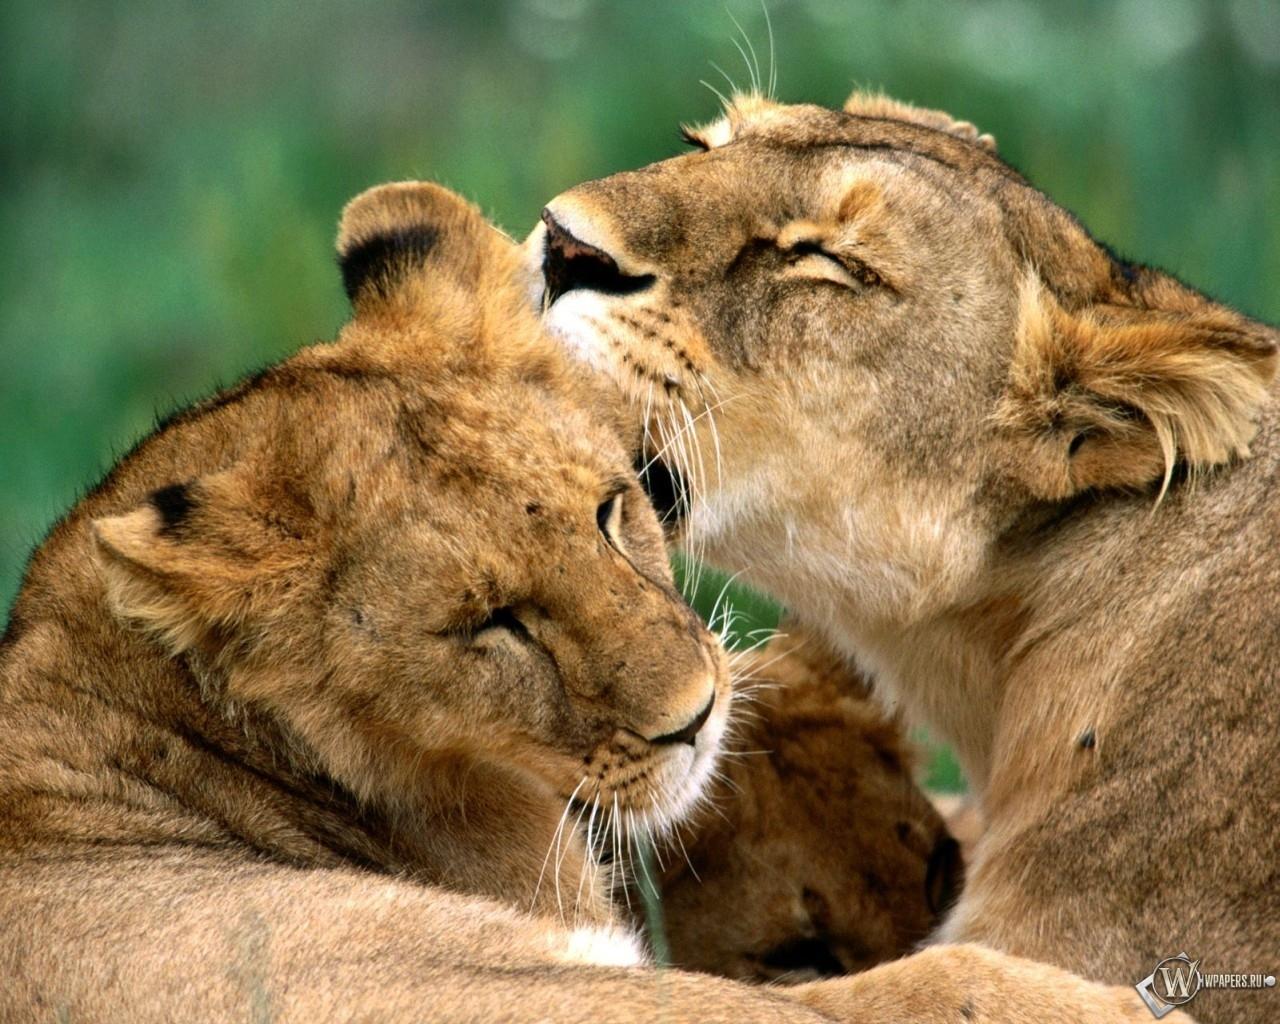 Две львицы 1280x1024